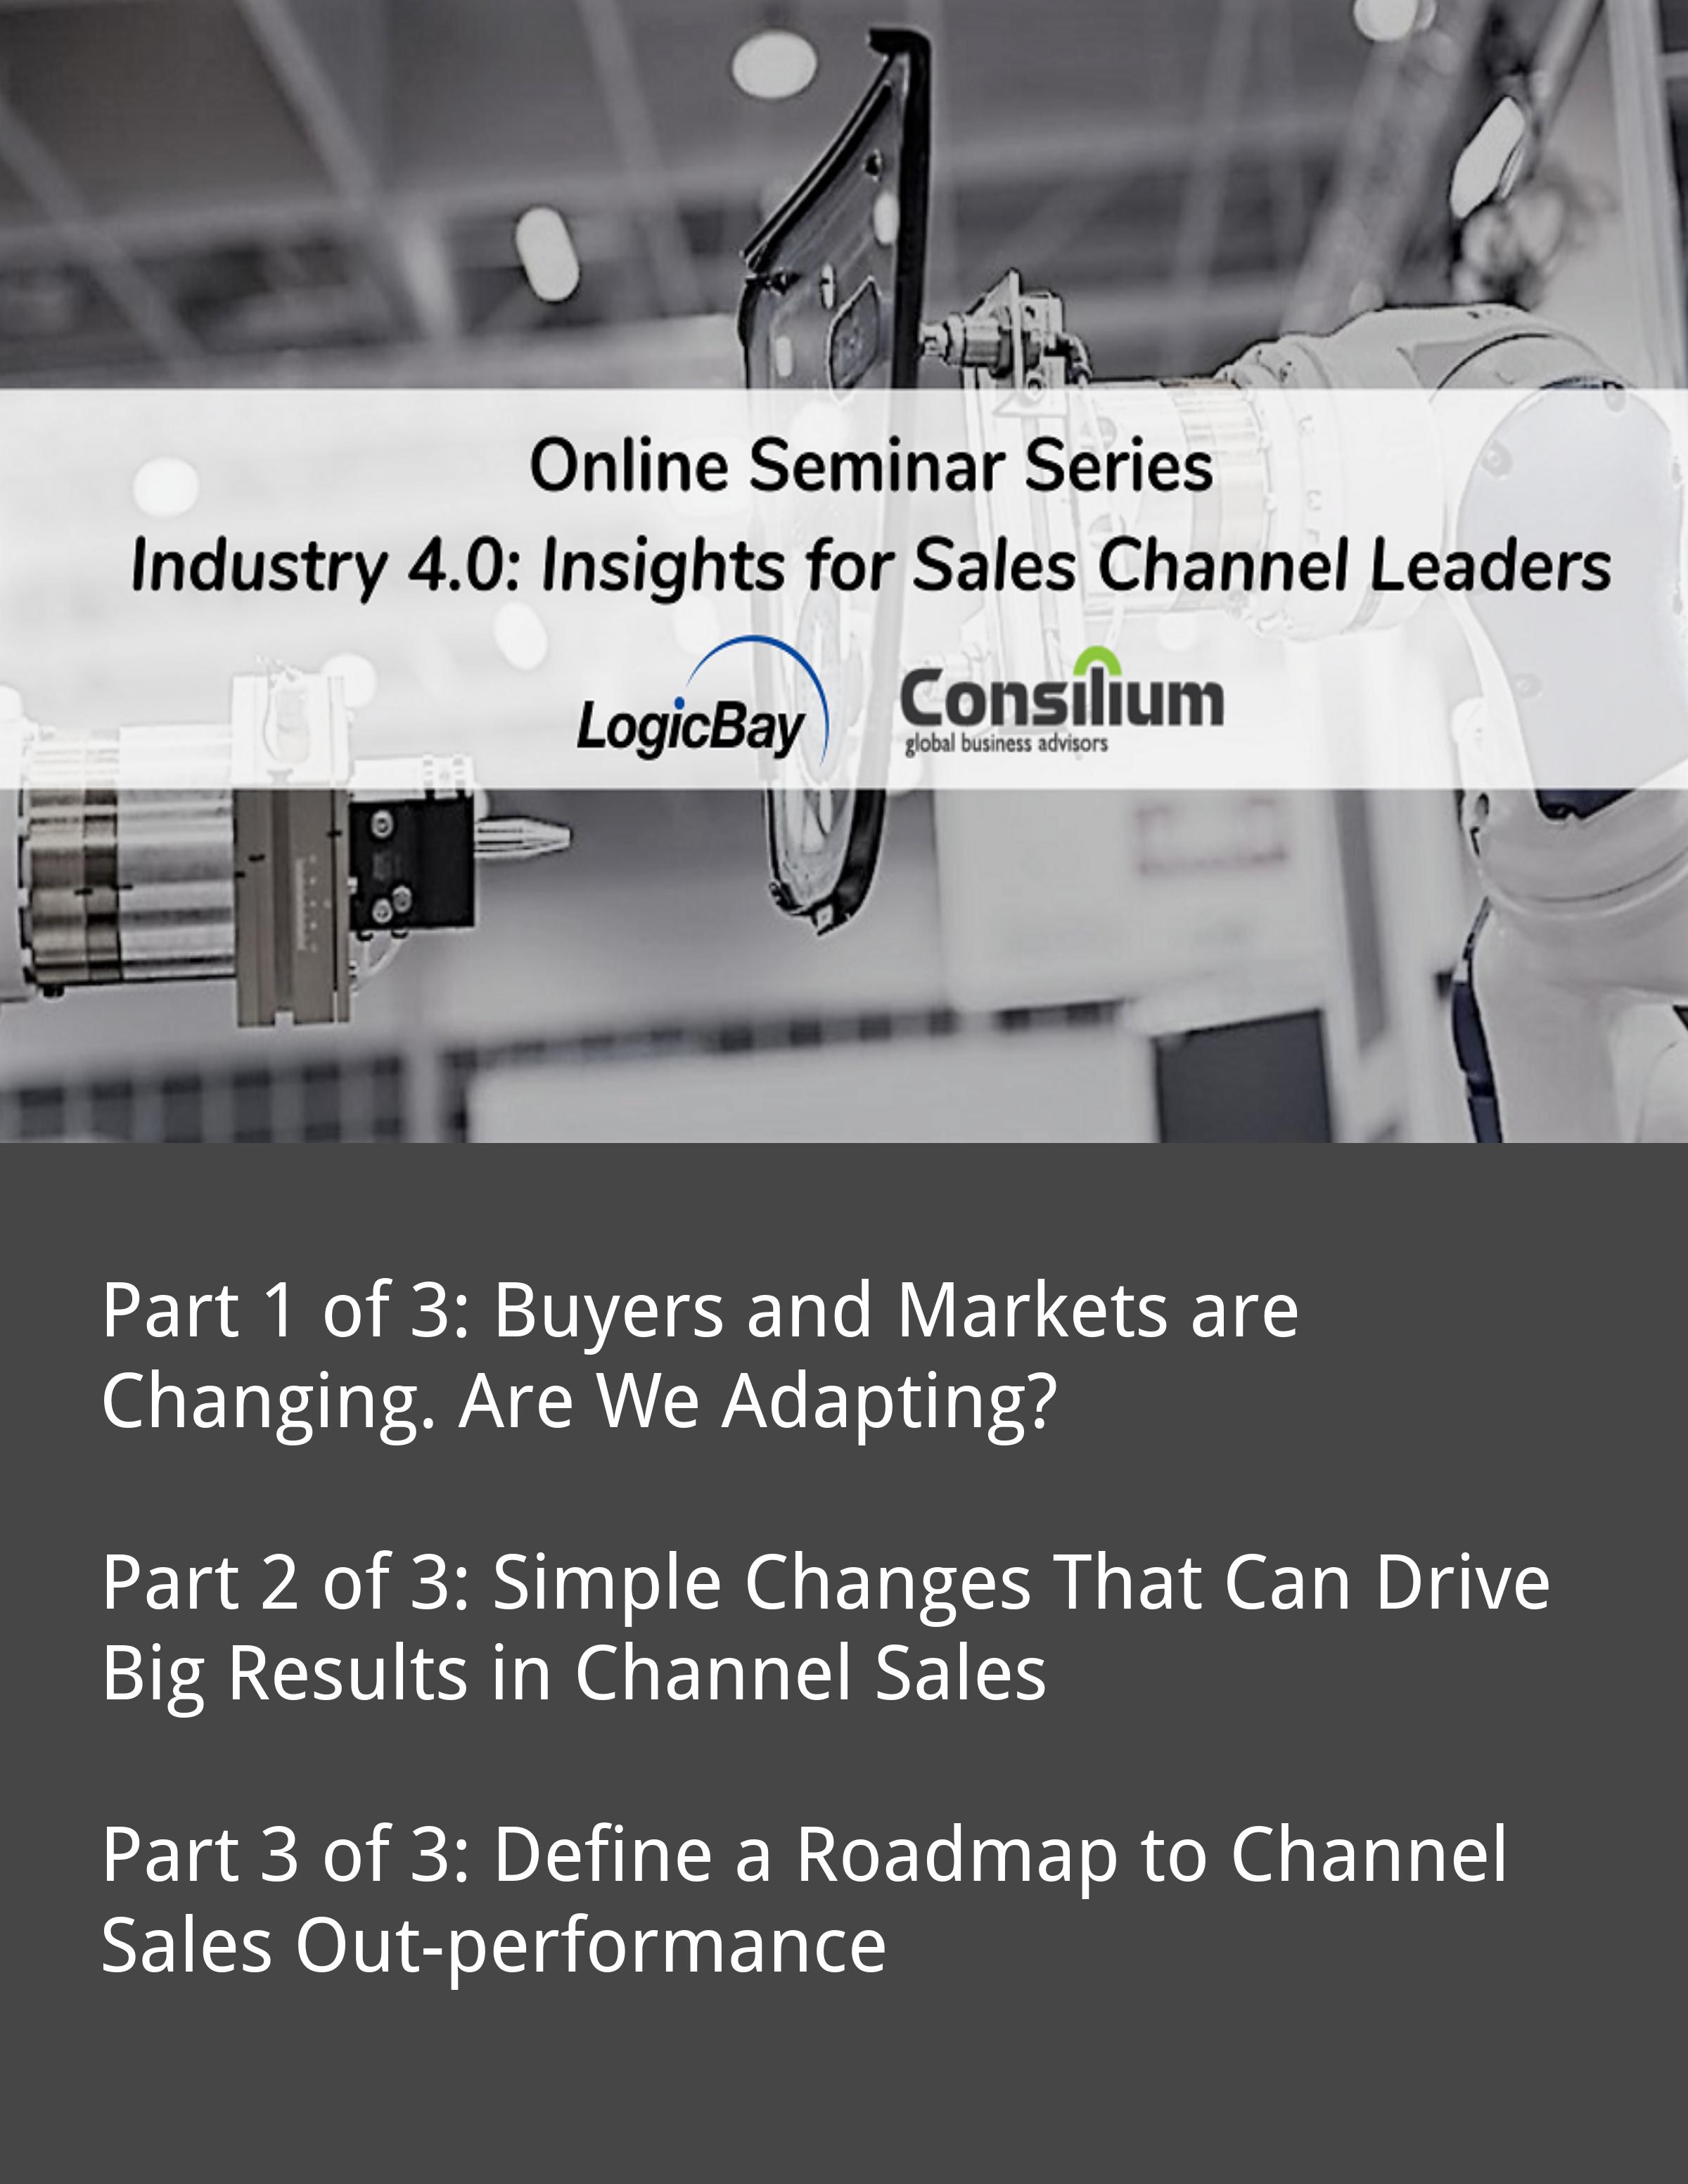 Online Seminar Image-1